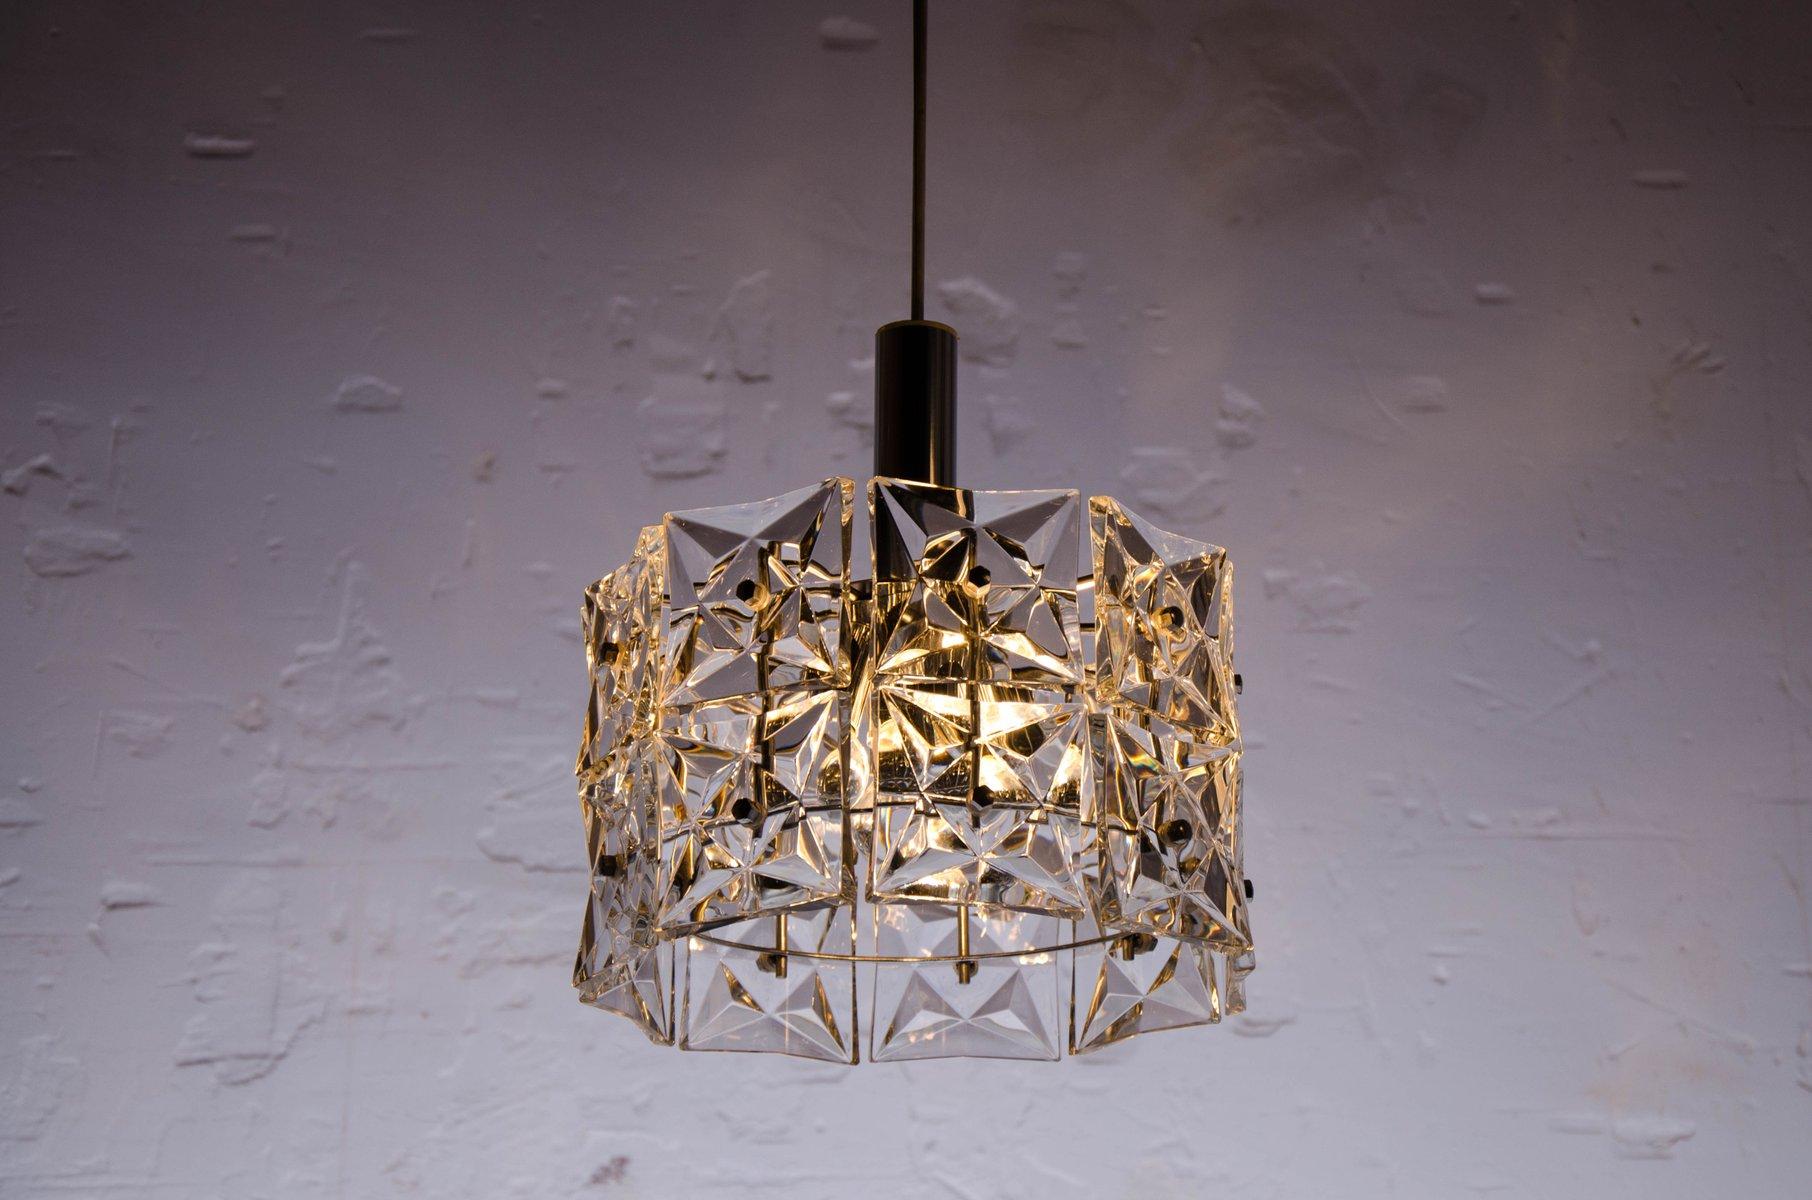 Vintage geometric crystal prism chandelier from kinkeldey for sale 87500 aloadofball Gallery